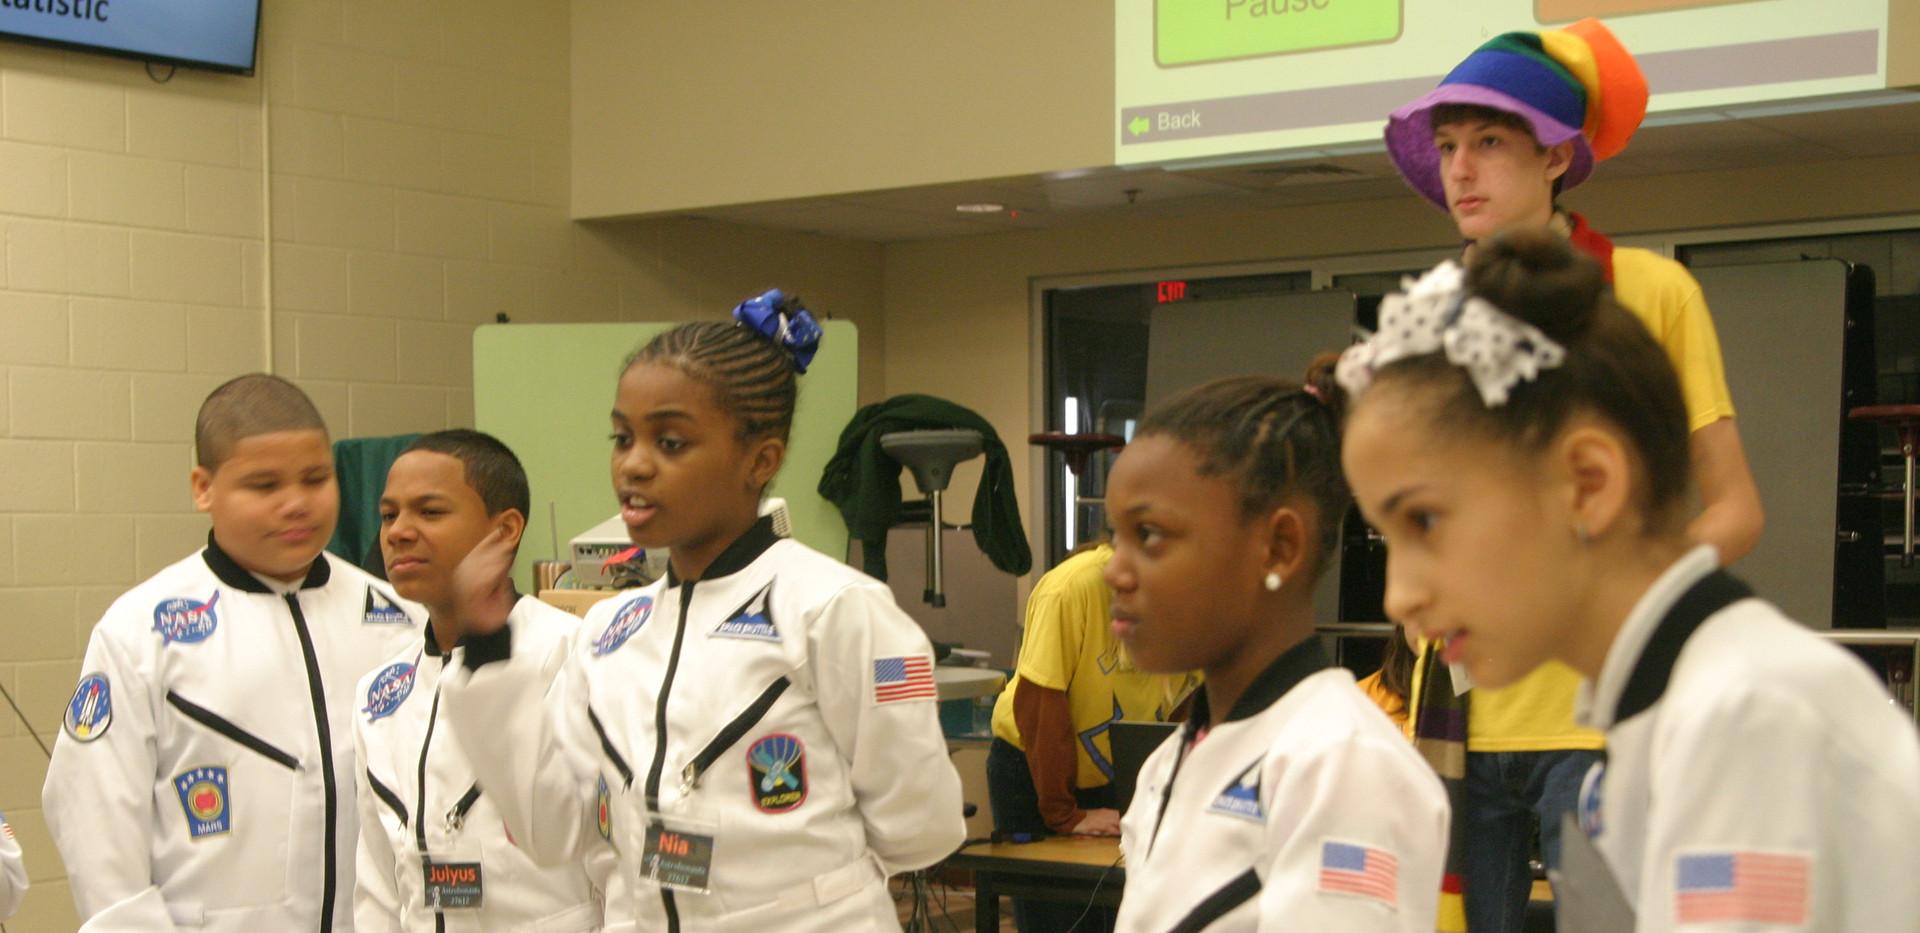 AstroBOnauts at Robotics competition